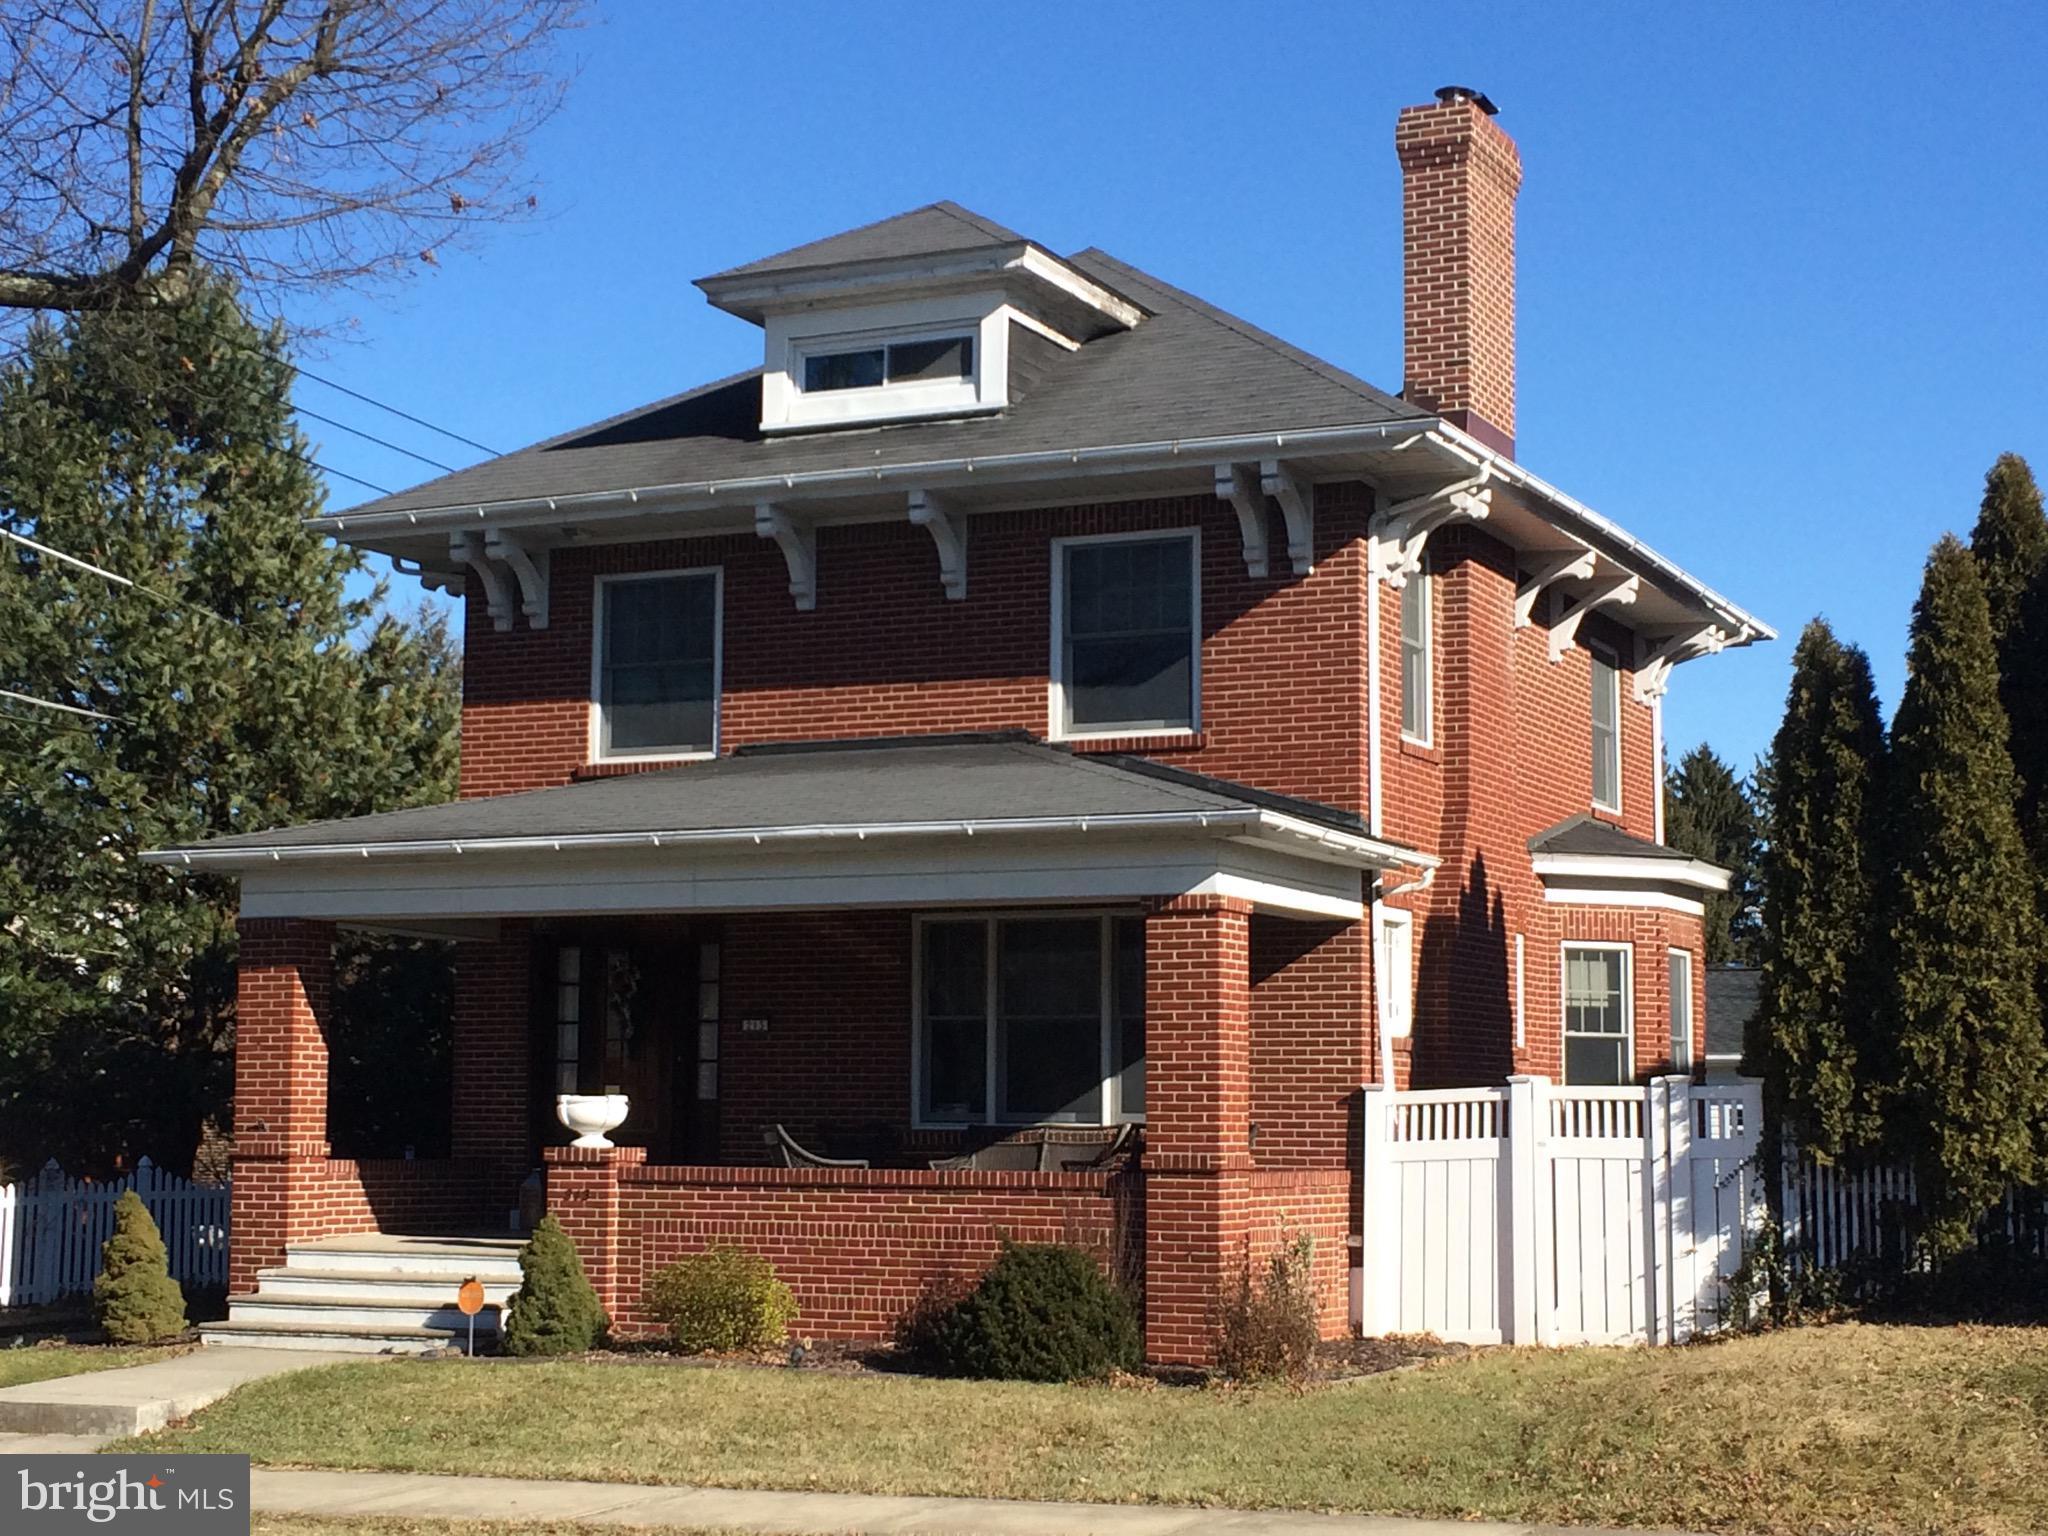 213 S 24TH ST STREET, ALLENTOWN, PA 18104